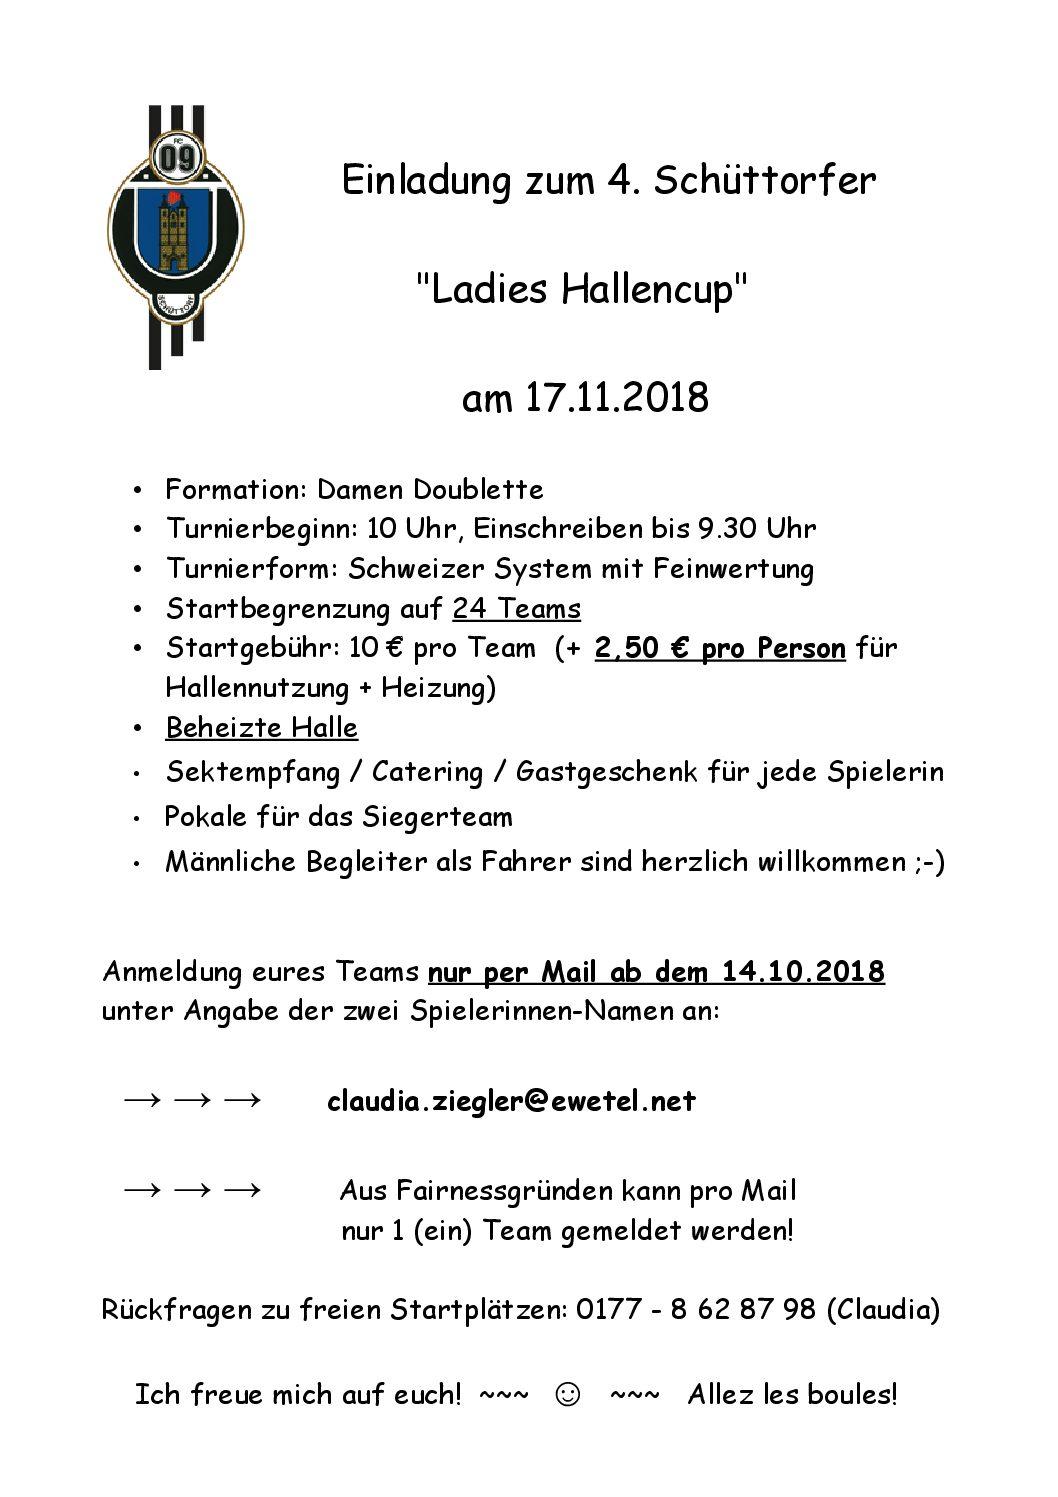 Ladies Hallencup